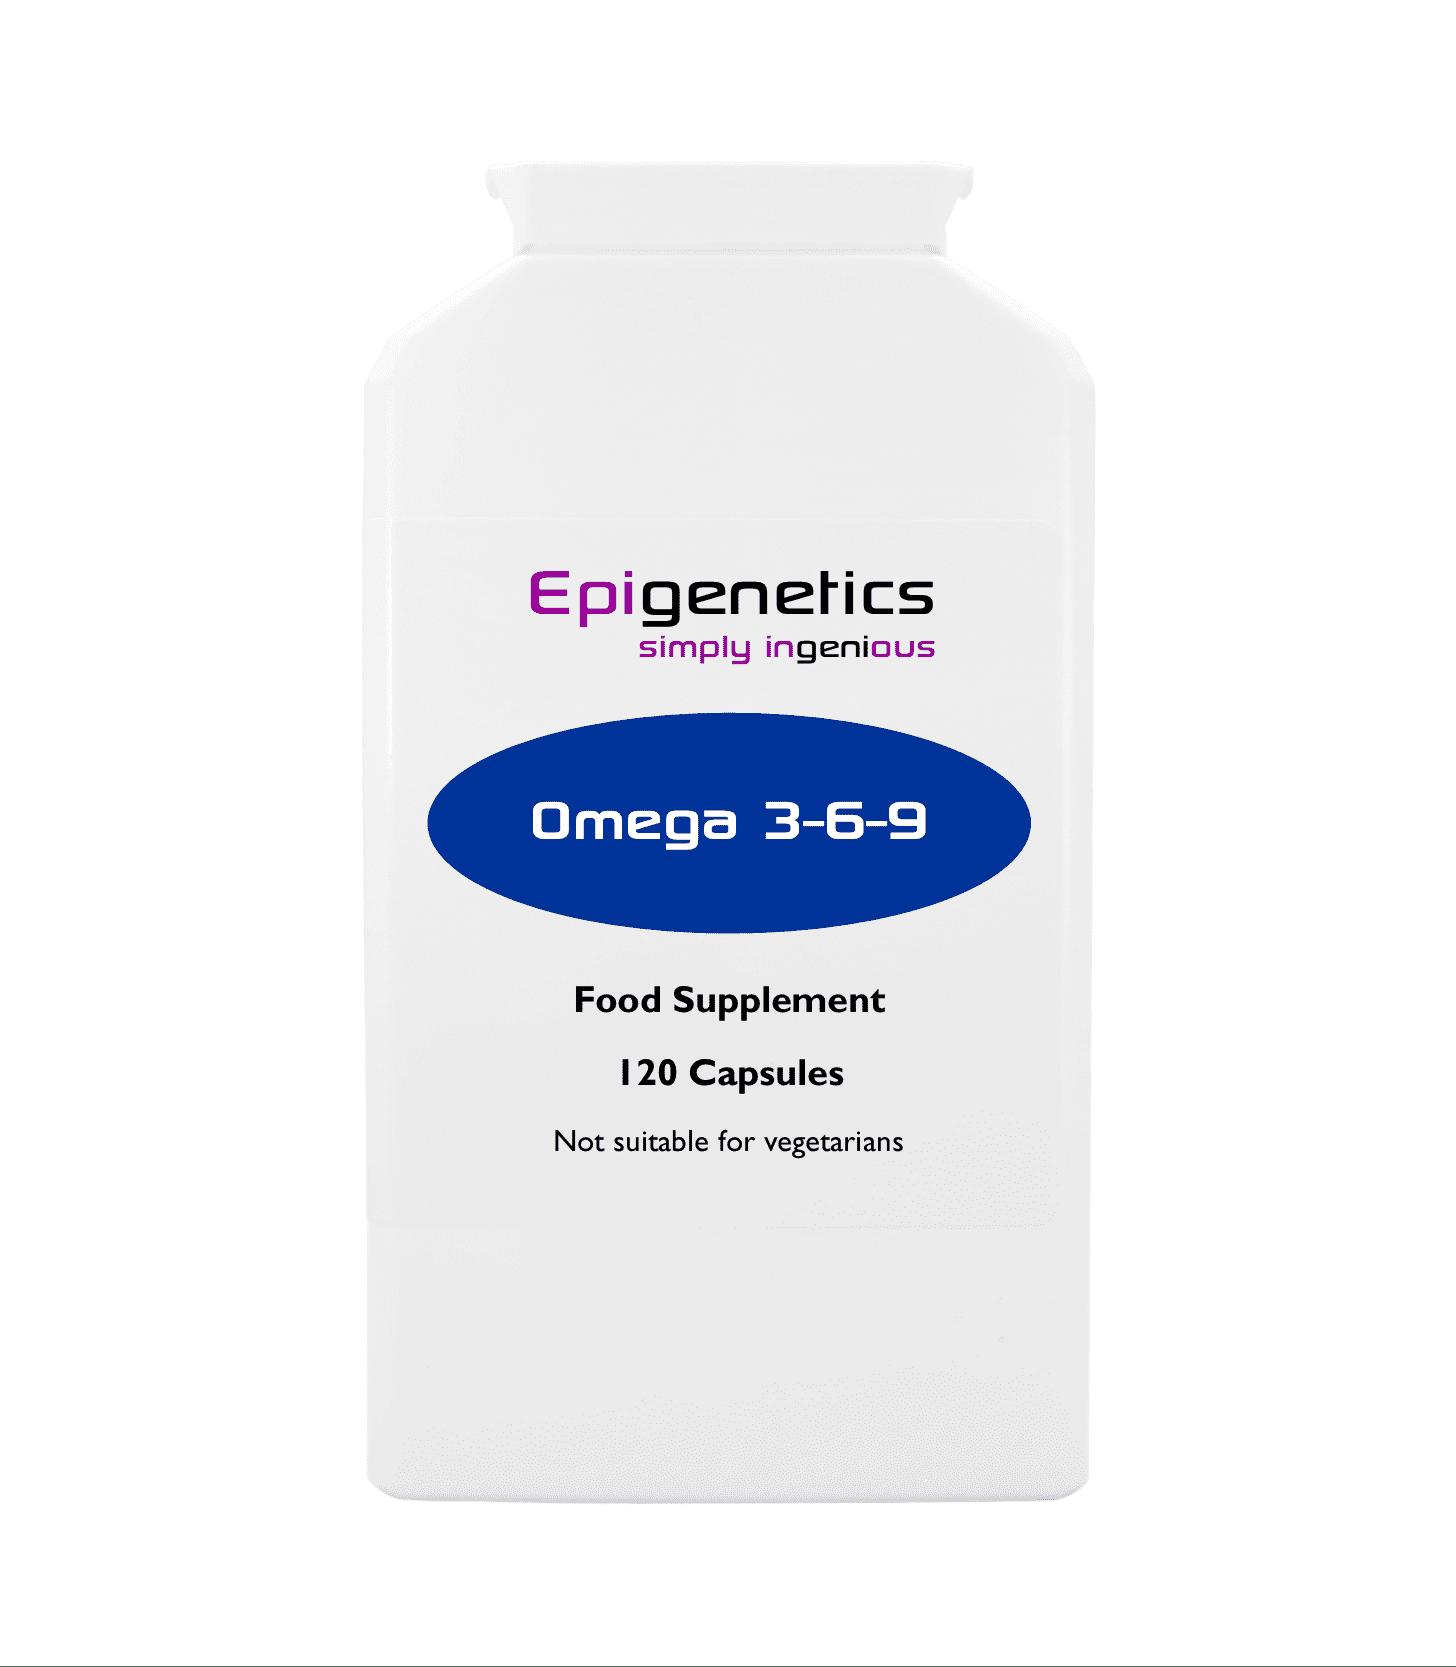 Omega 3 6 9 Pack Of 120 Capsules Epigenetics